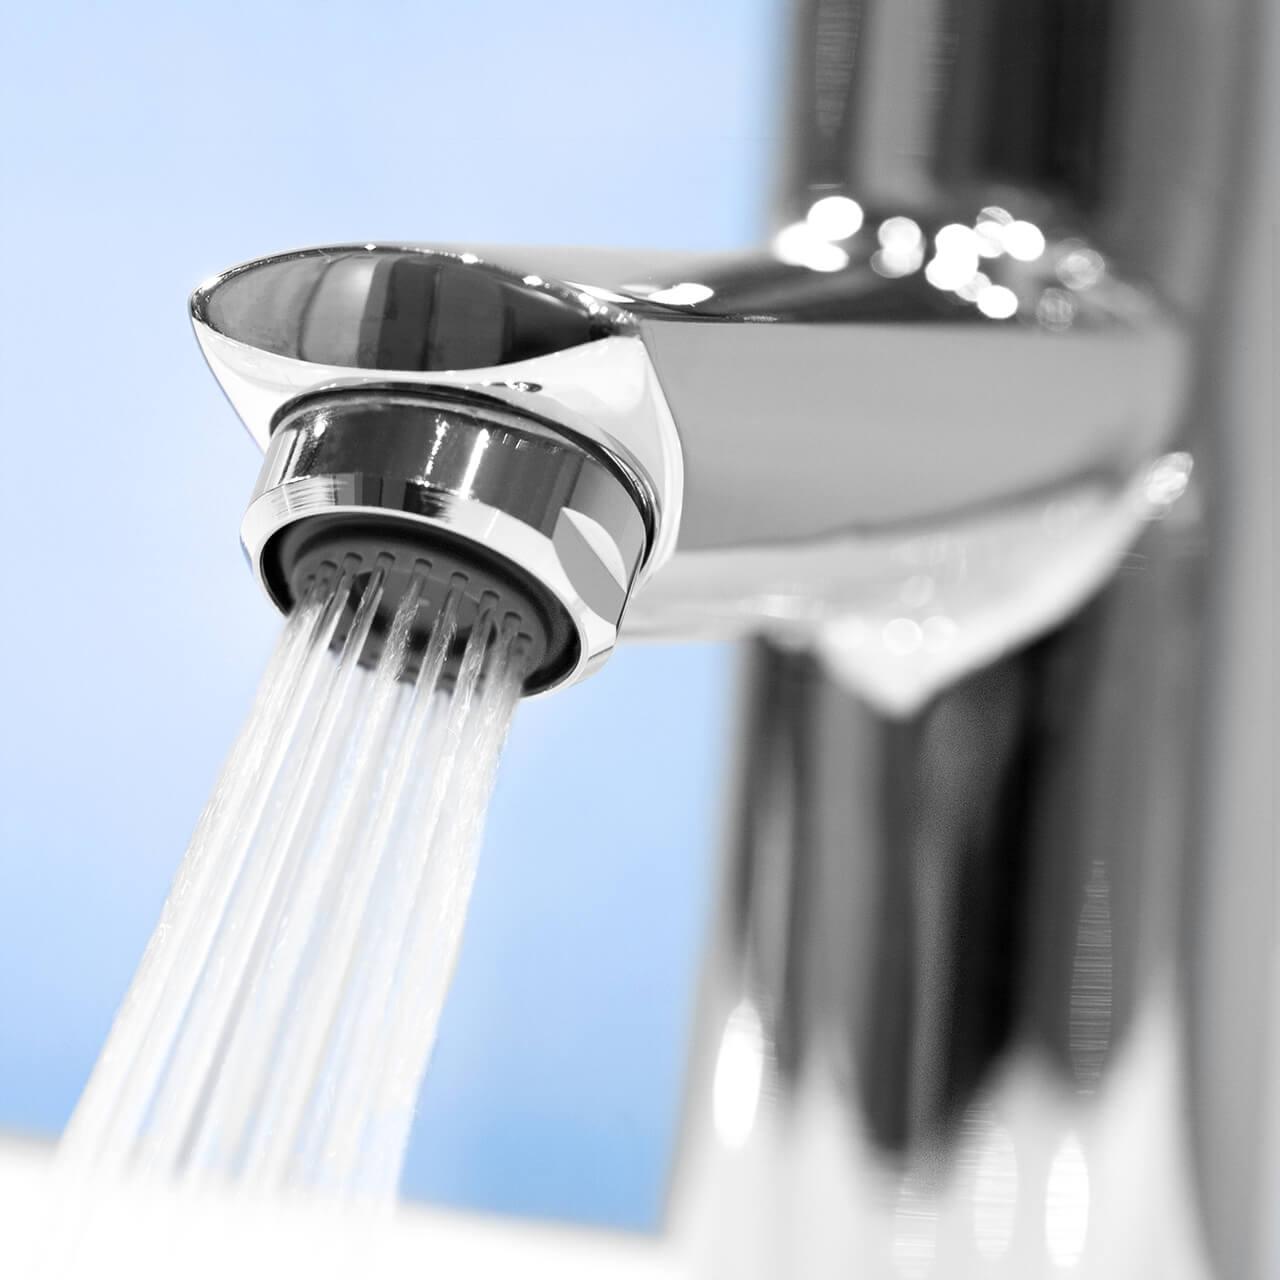 Aireador de ahorro de agua Neoperl Spray 3 l/min - Rosca